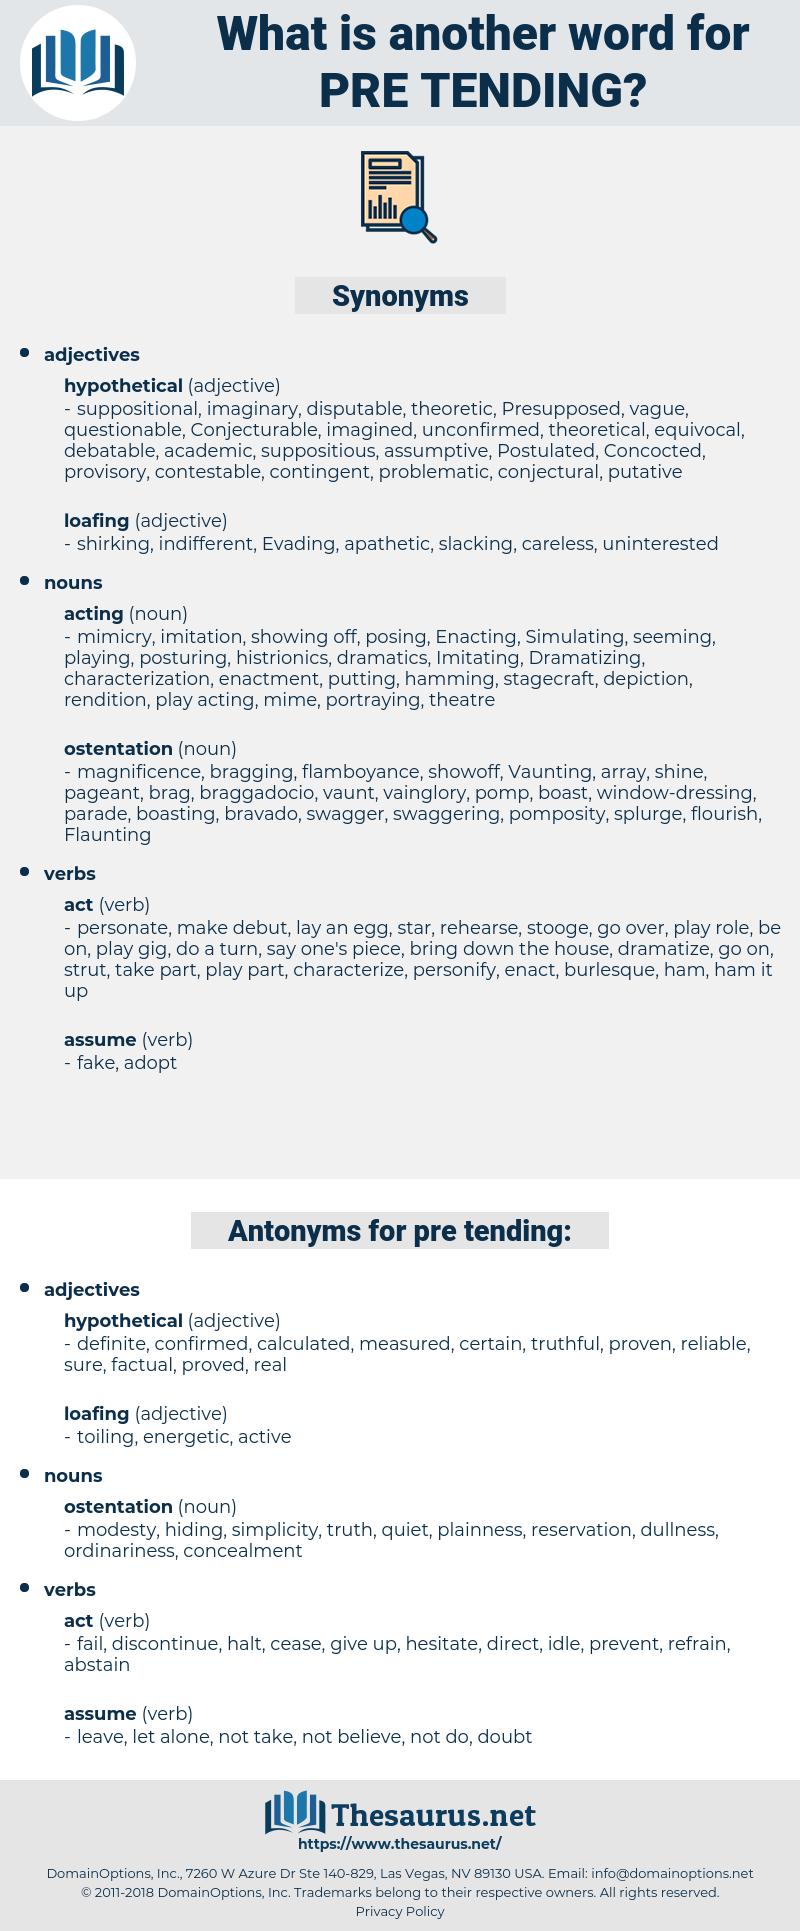 pre tending, synonym pre tending, another word for pre tending, words like pre tending, thesaurus pre tending